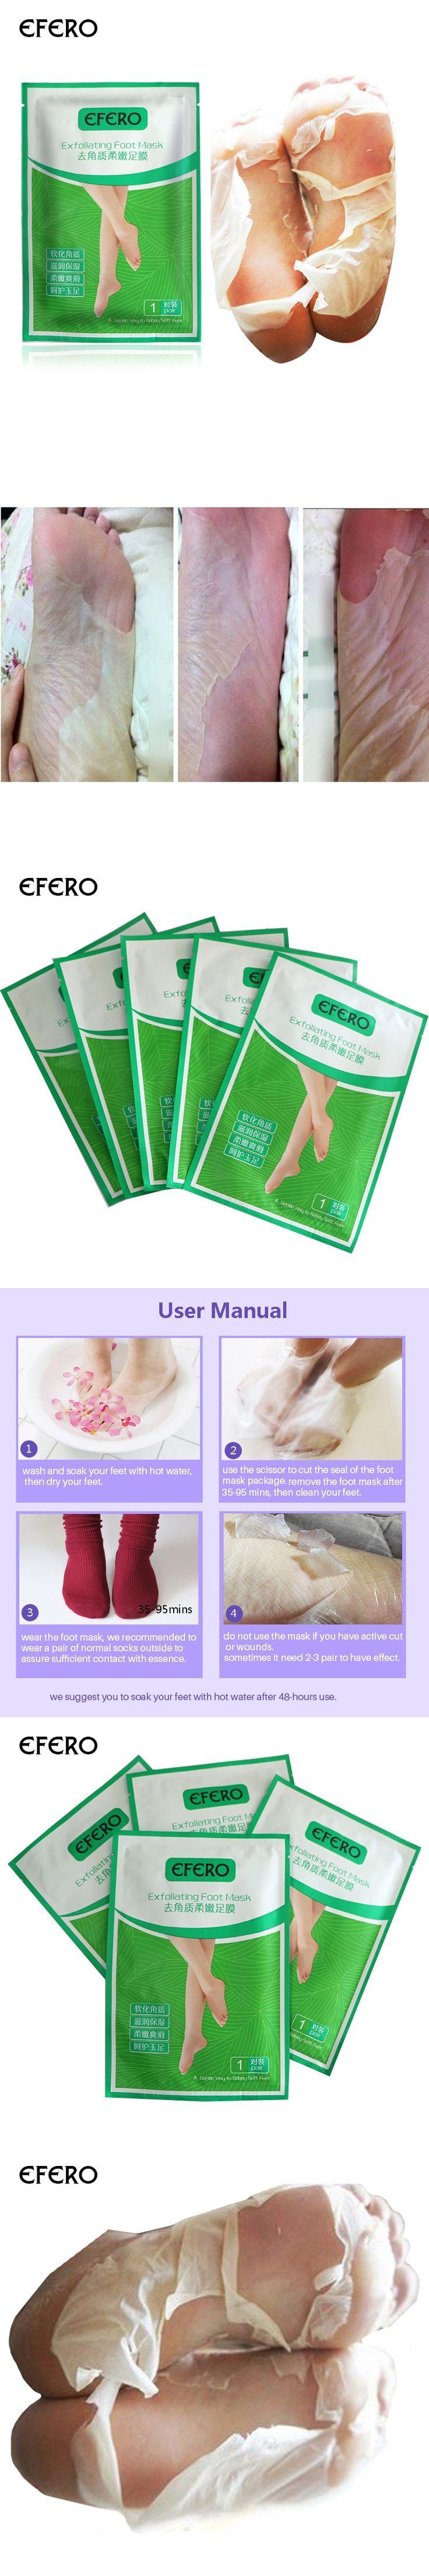 2Pack efero Feet Mask Baby Foot Exfoliation Sock Peeling Exfoliating Foot Mask Remove Dead Skin Cuticle Foot Care Pedicure Socks